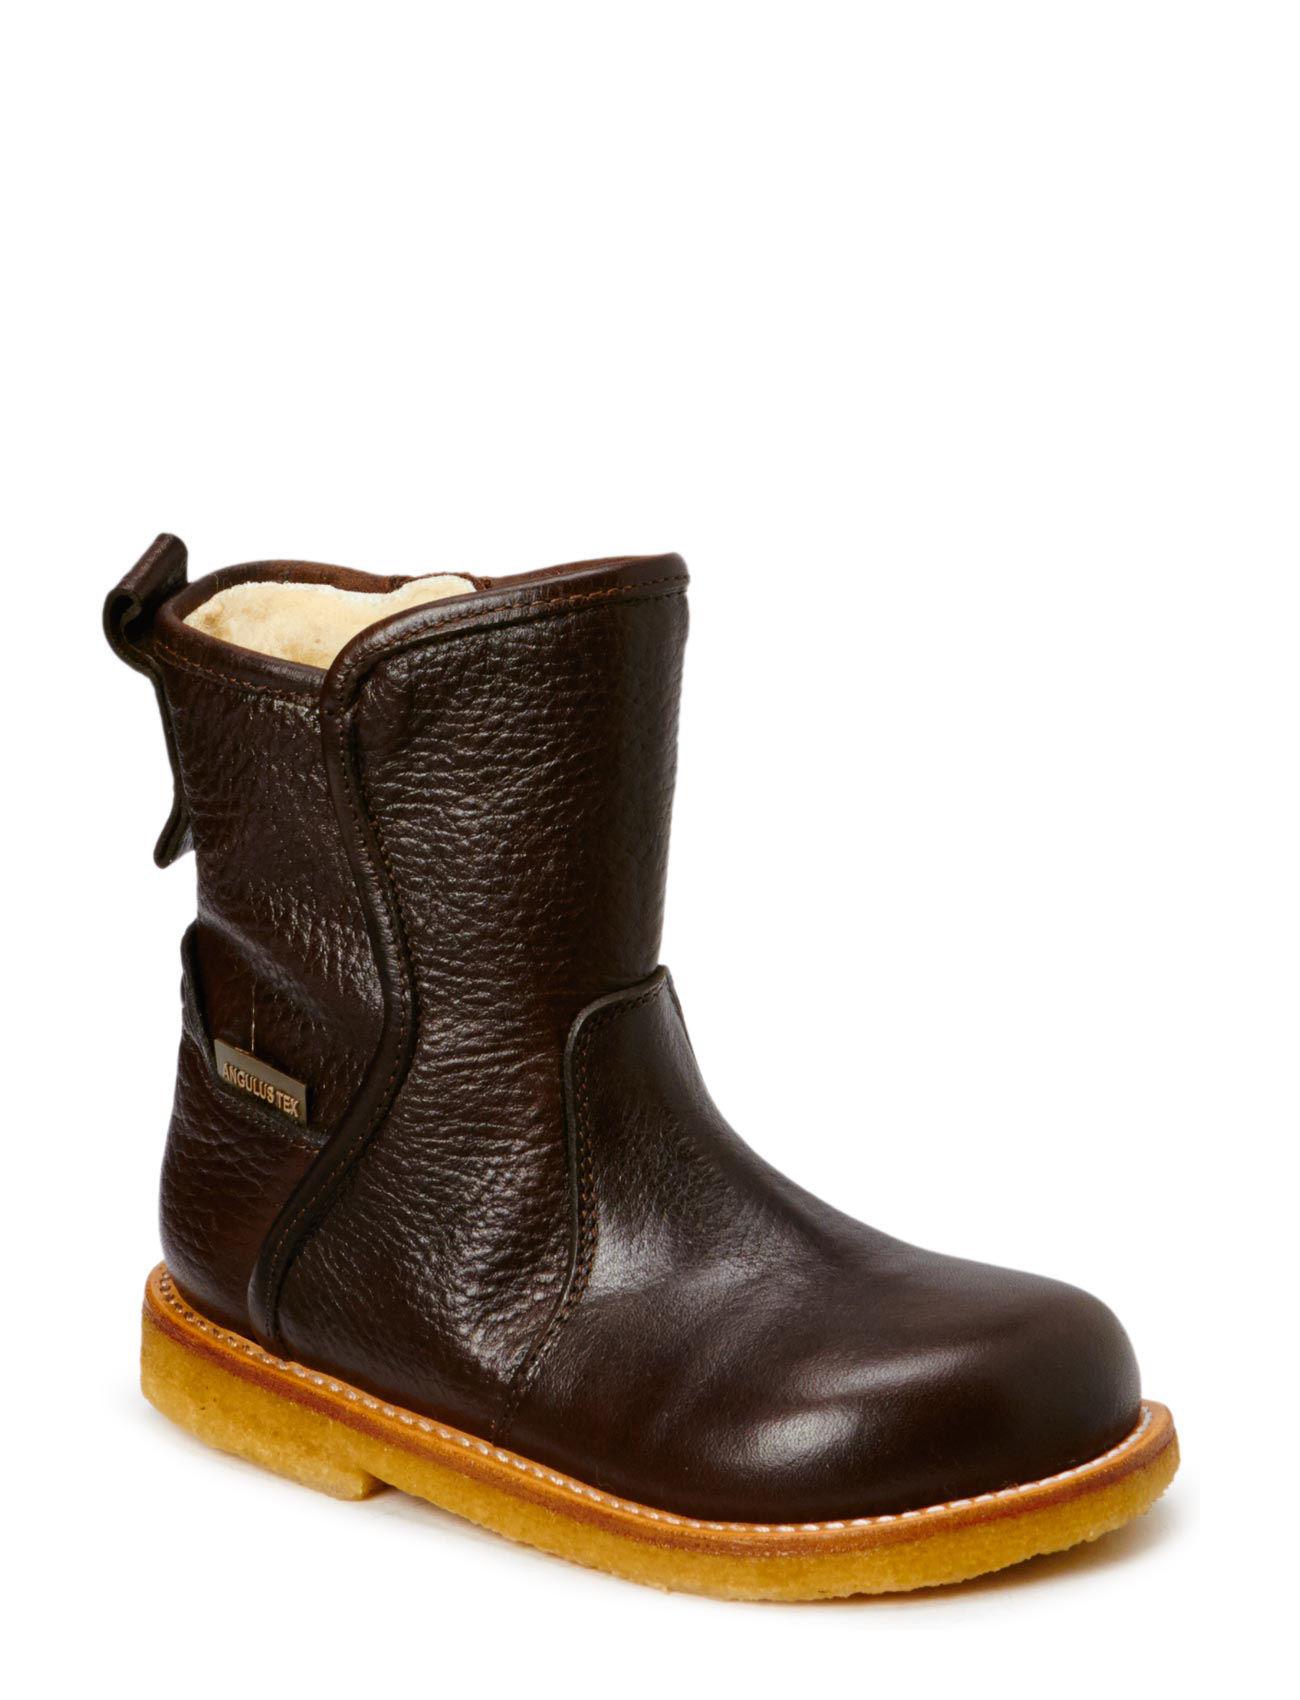 Booties - Flat - With Zipper ANGULUS Støvler til Børn i